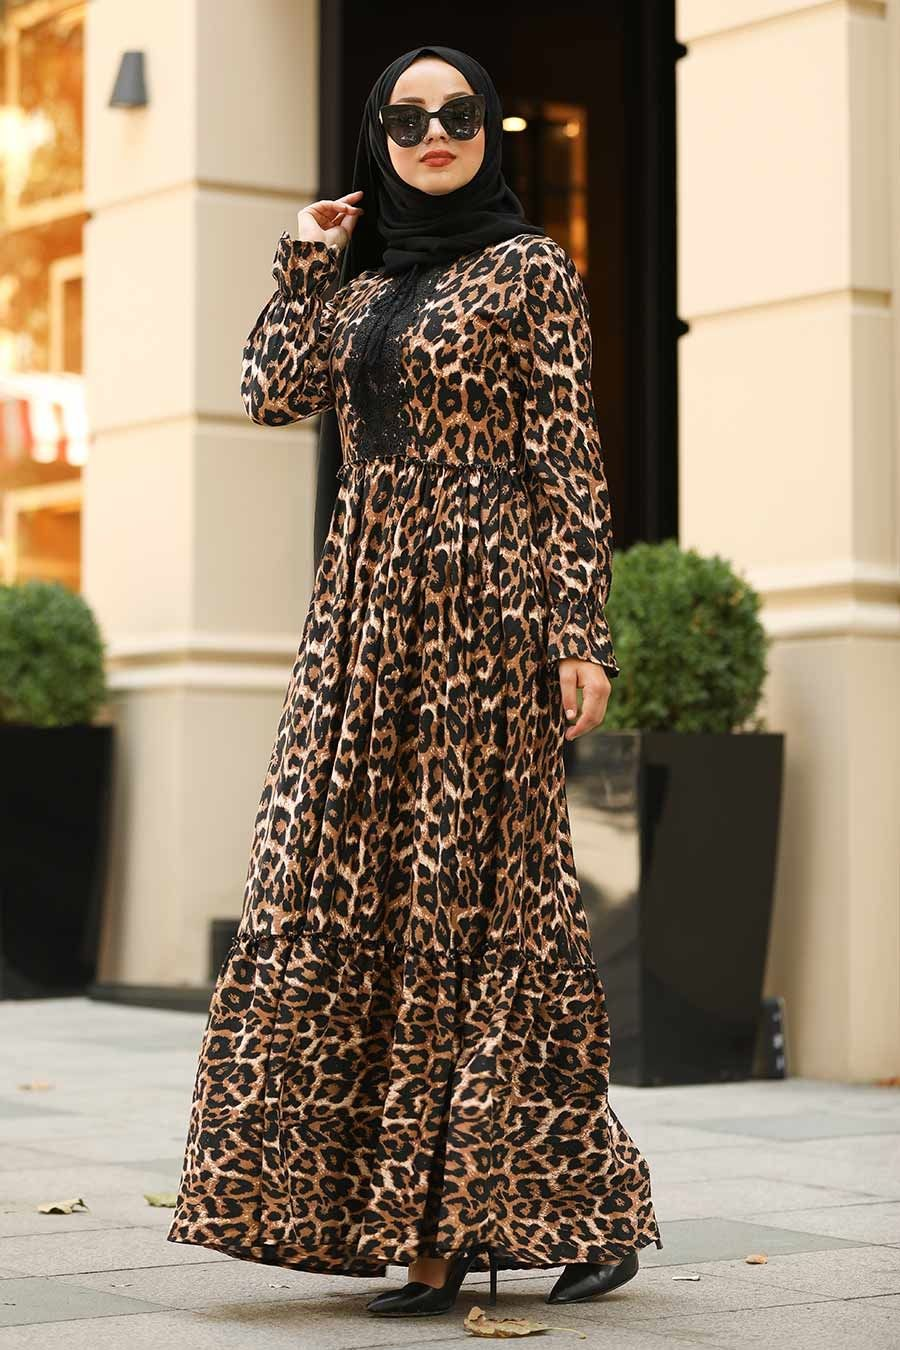 Neva Style Leopar Desenli Tesettur Elbise 3998lp Tesetturisland Com 2020 Elbise Moda Stilleri The Dress